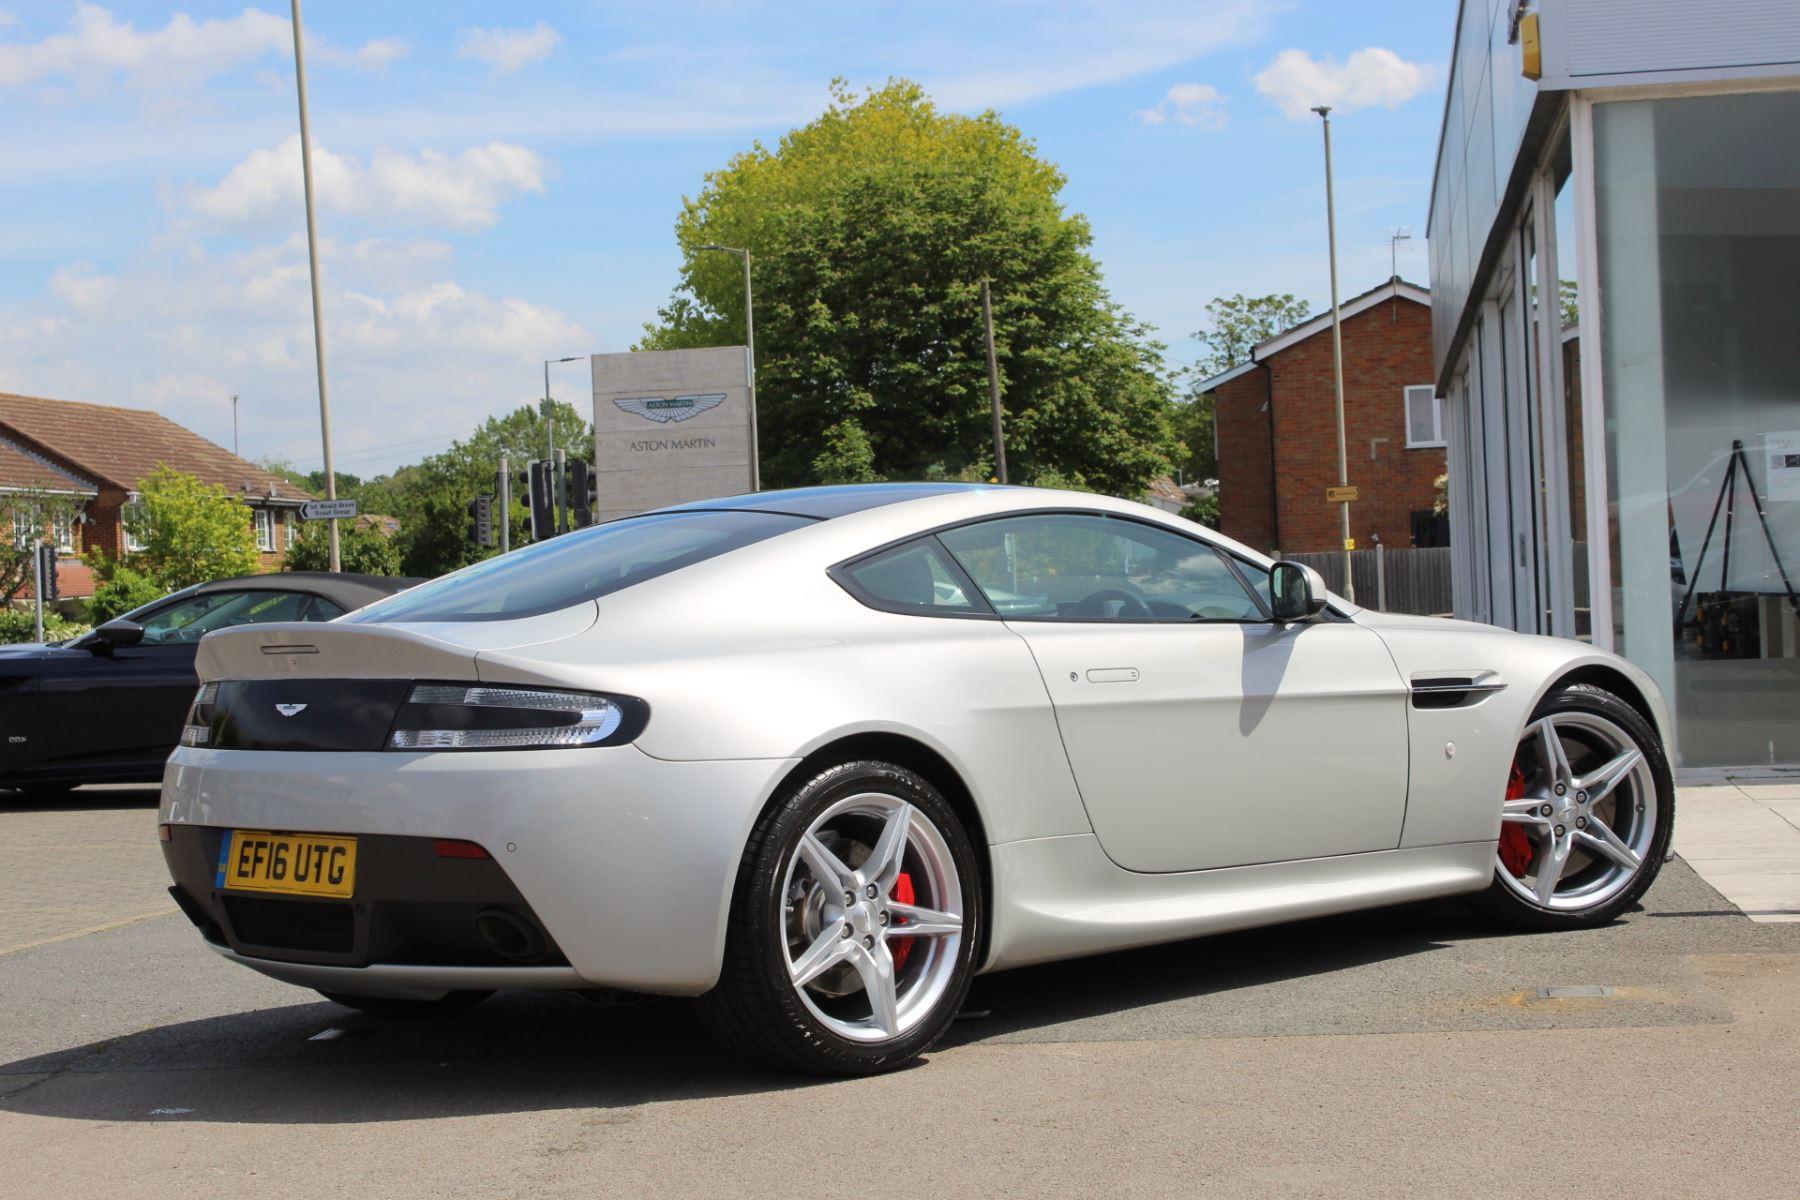 Aston Martin V8 Vantage Coupe 2dr [420] Latest Dash, 420BHP image 12